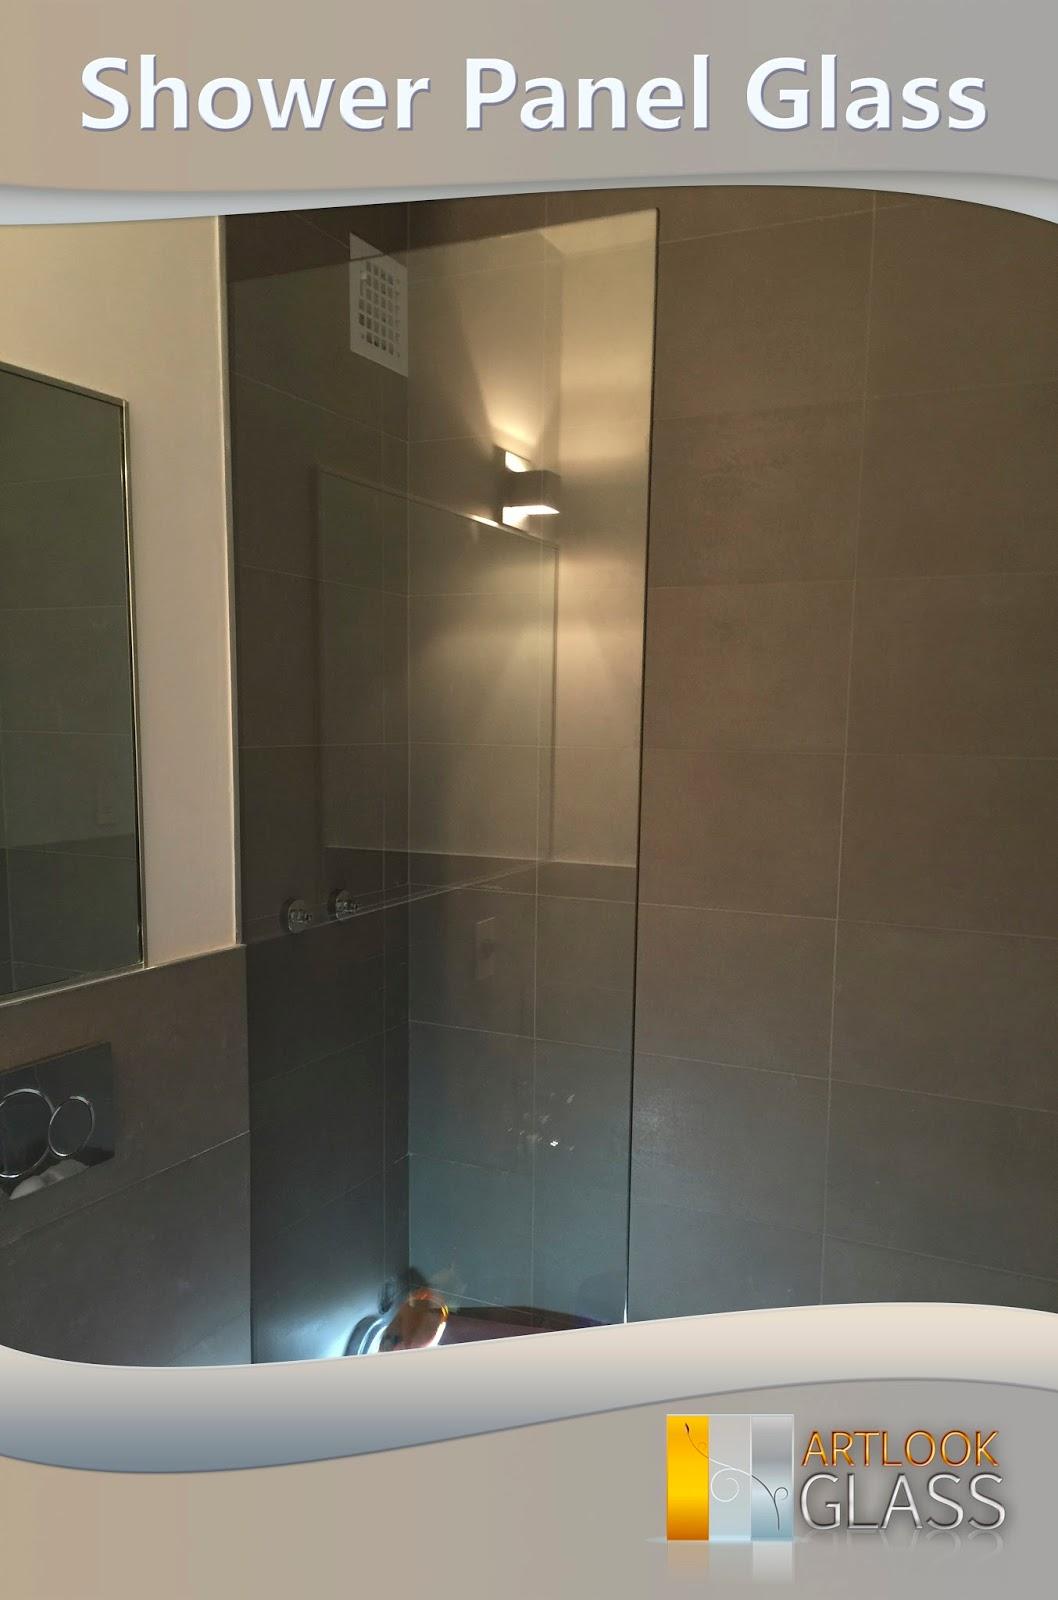 Shower Panel Glass Shower Door Installation